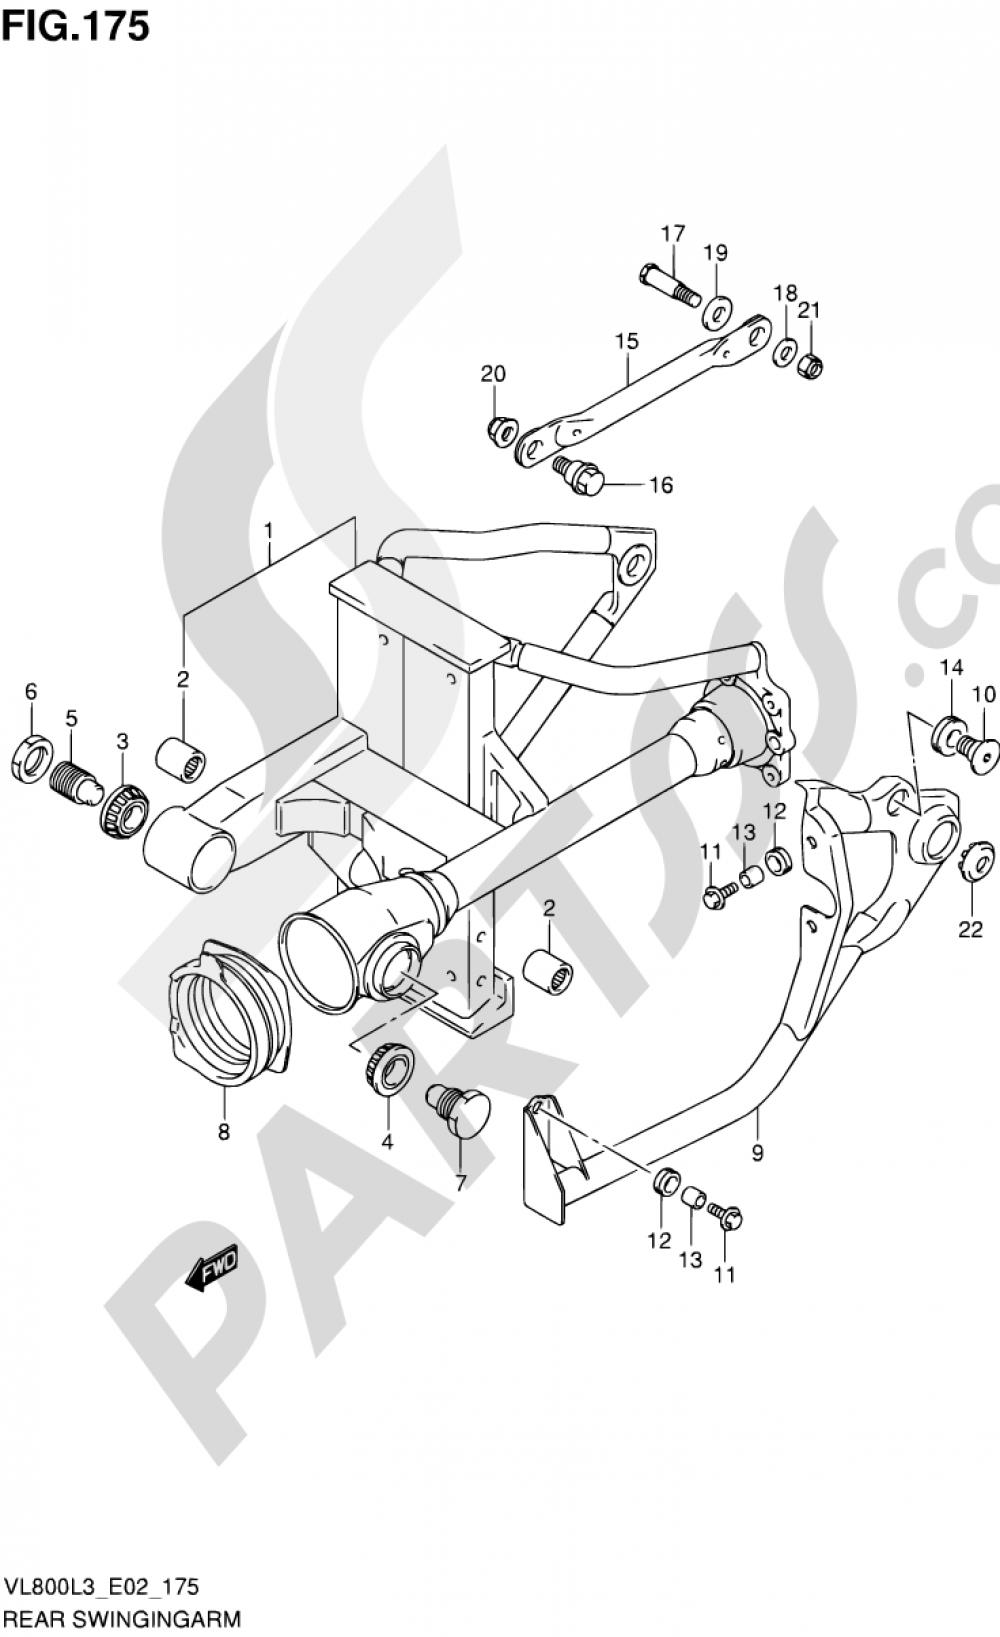 175 - REAR SWINGINGARM Suzuki INTRUDER VL800C 2013